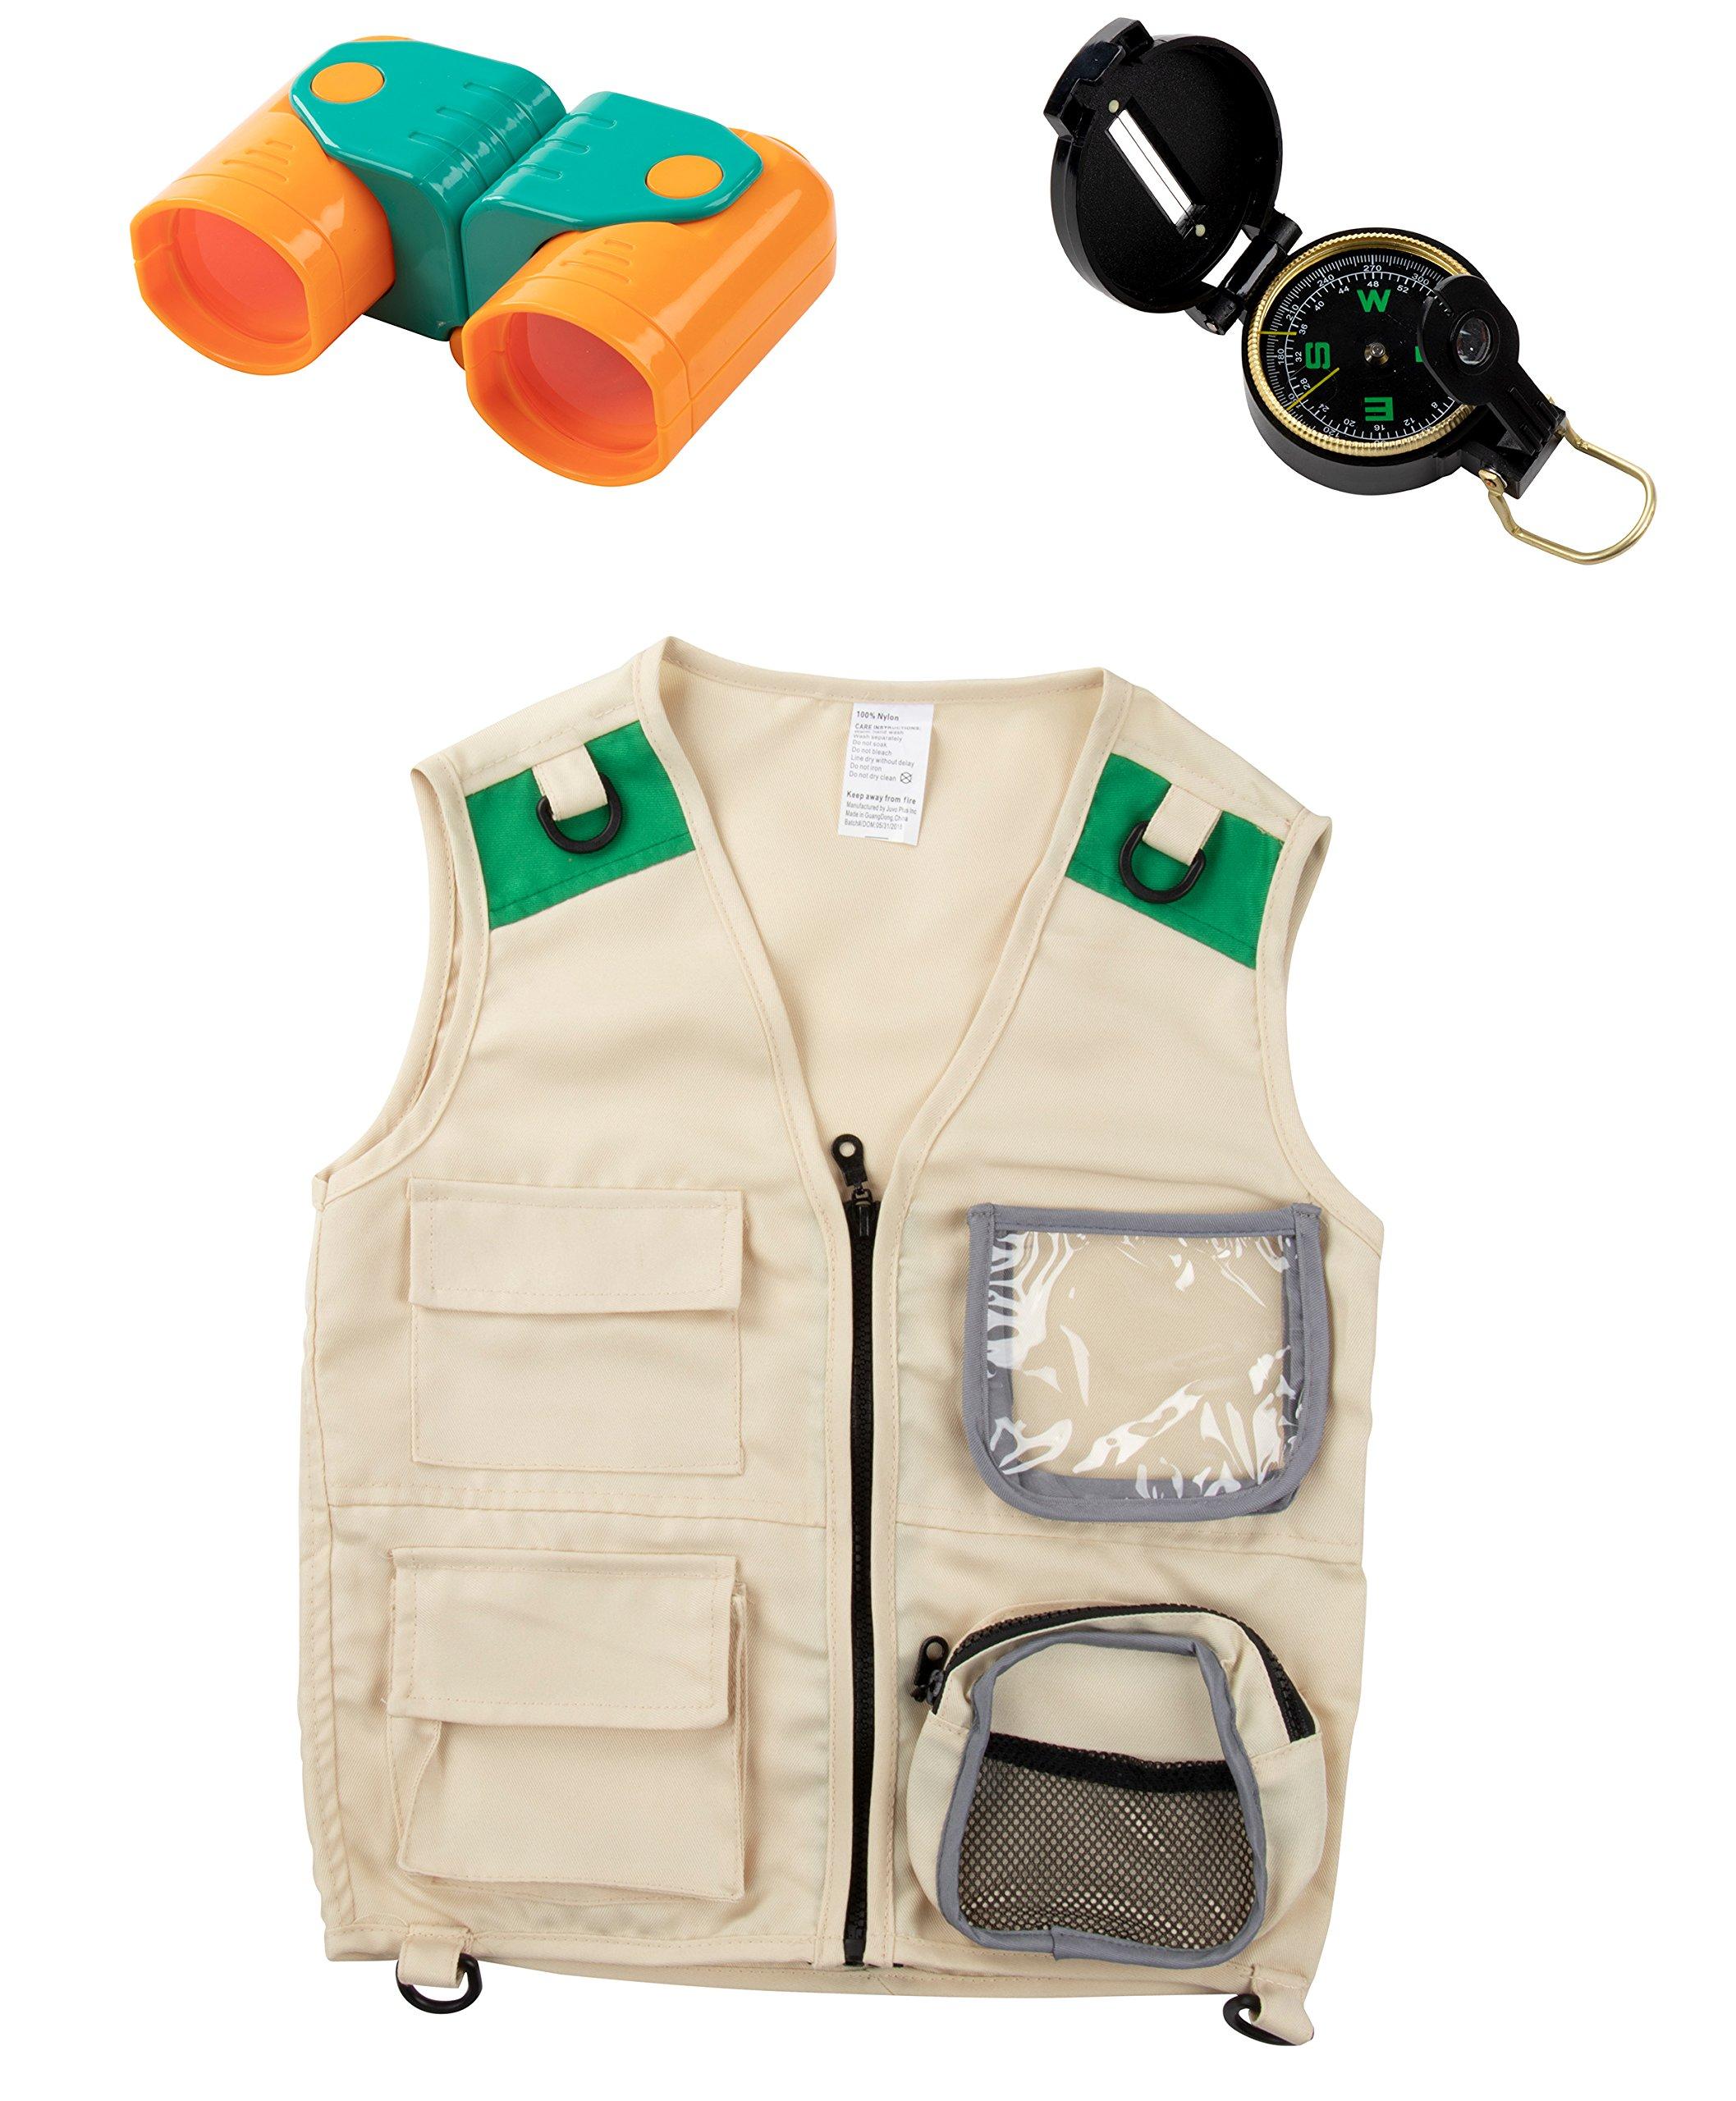 Blue Panda Kid Explorer Vest Kit - 3-Piece Outdoor Exploration Set Includes Cargo Vest, Compass Binoculars Kids' Pretend Play Nature Safari Costume